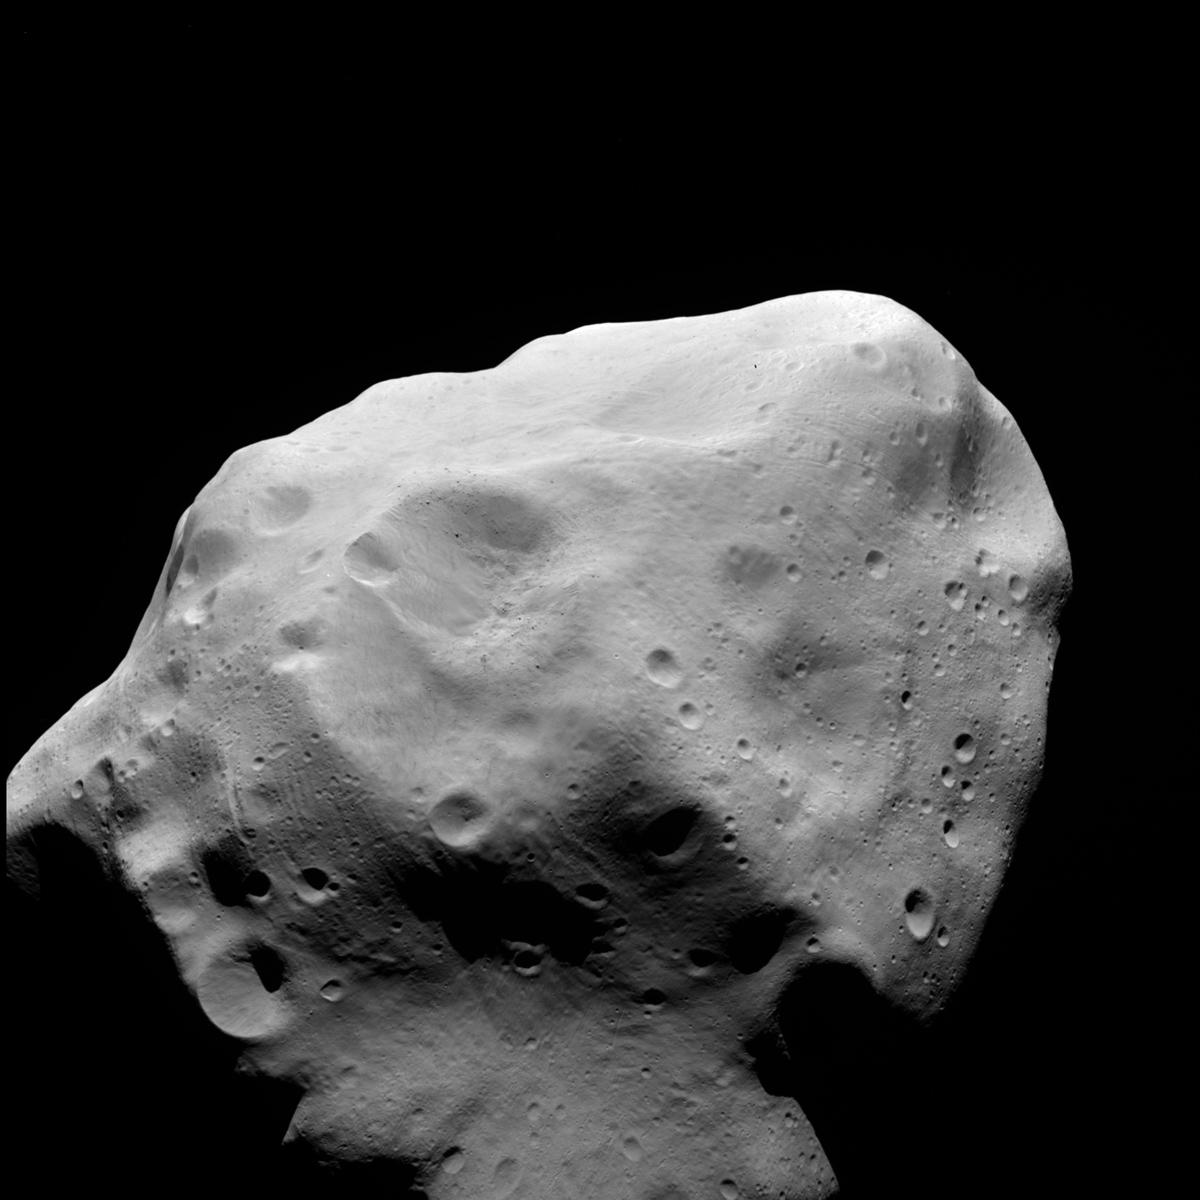 Asteroid Lutetia Seen by OSIRIS July 2010 2